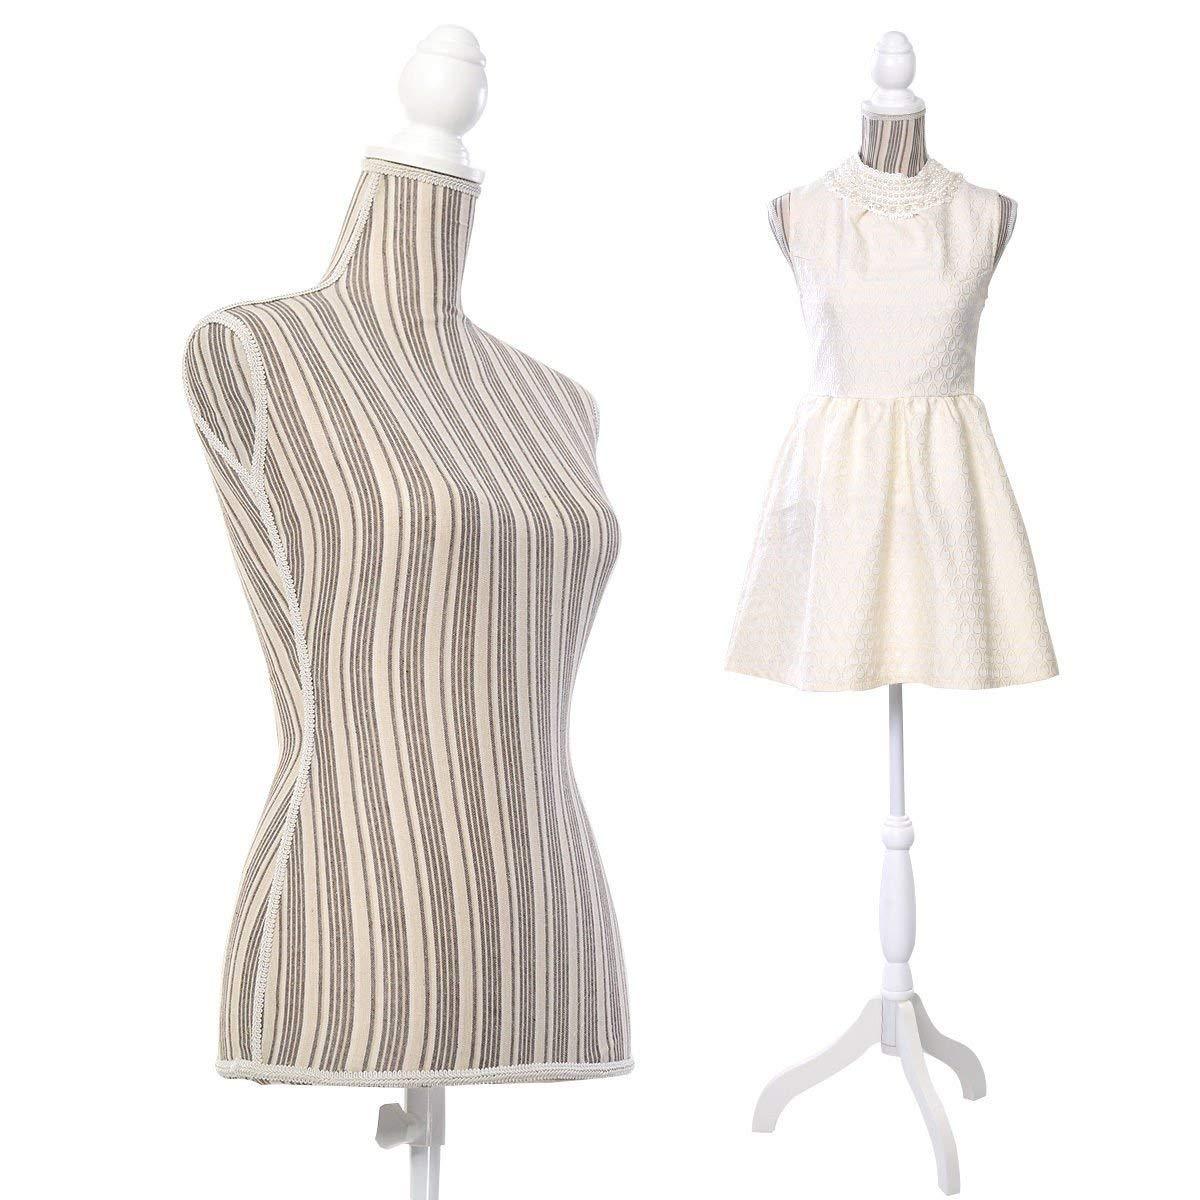 Adjustable Female Mannequin Torso Dress Form Display w// Tripod Stand Styrofoam